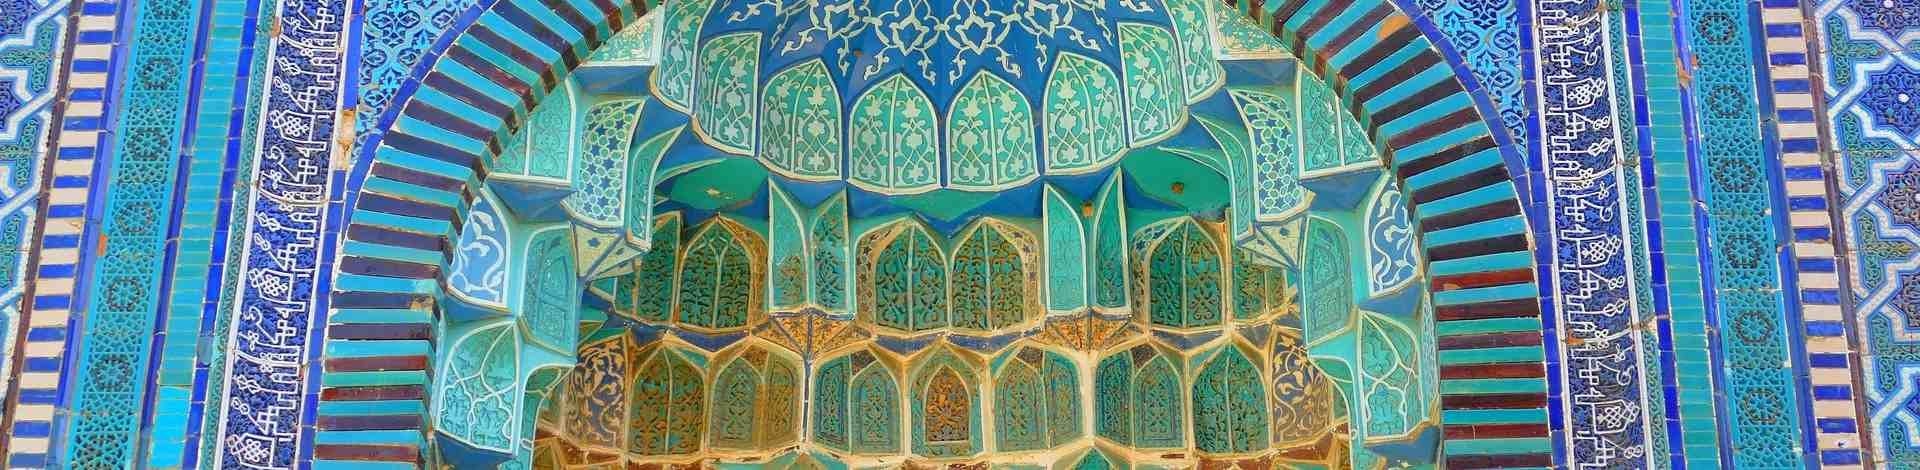 Mosaïques Mosquée medersa Ouzbékistan Khiva Boukhara Samarkand